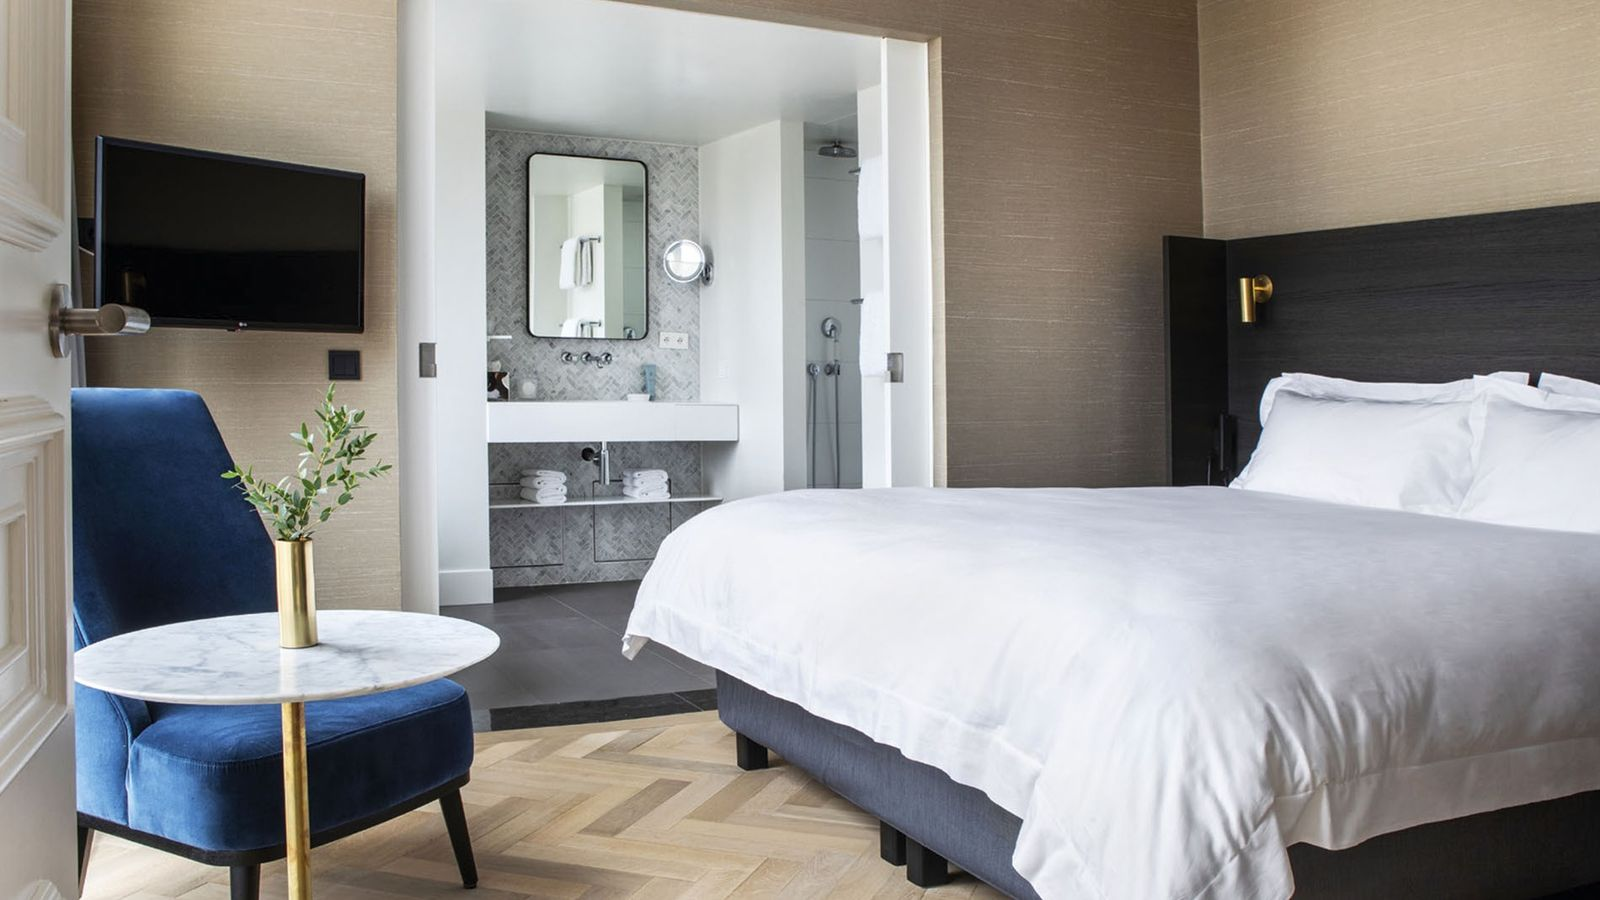 Pillows Grand Hotel Reylof